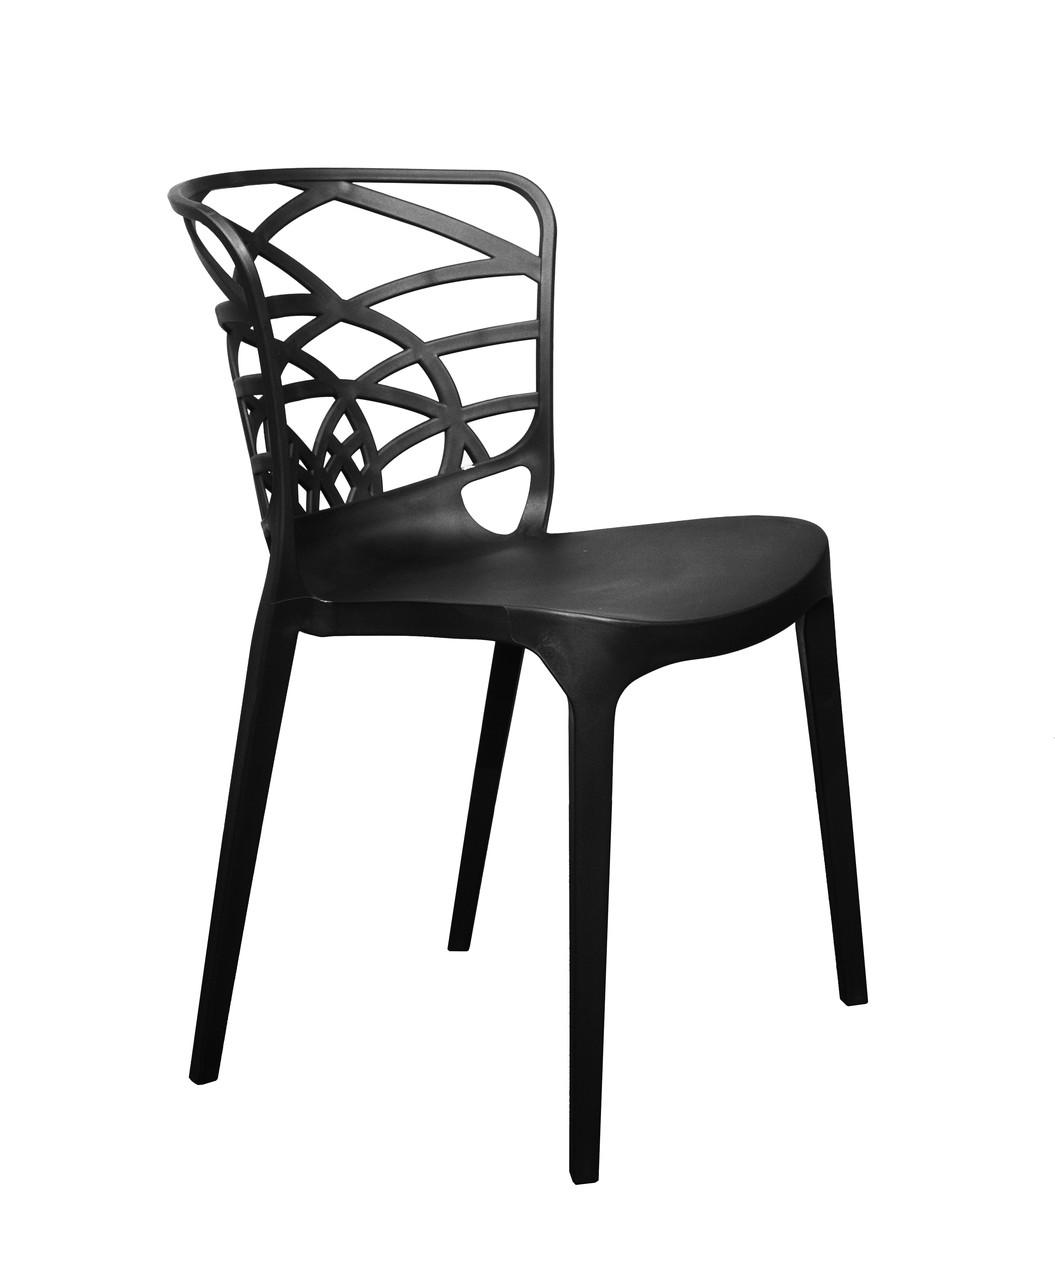 Пластиковый стул Коралл, TM VivatFurniture